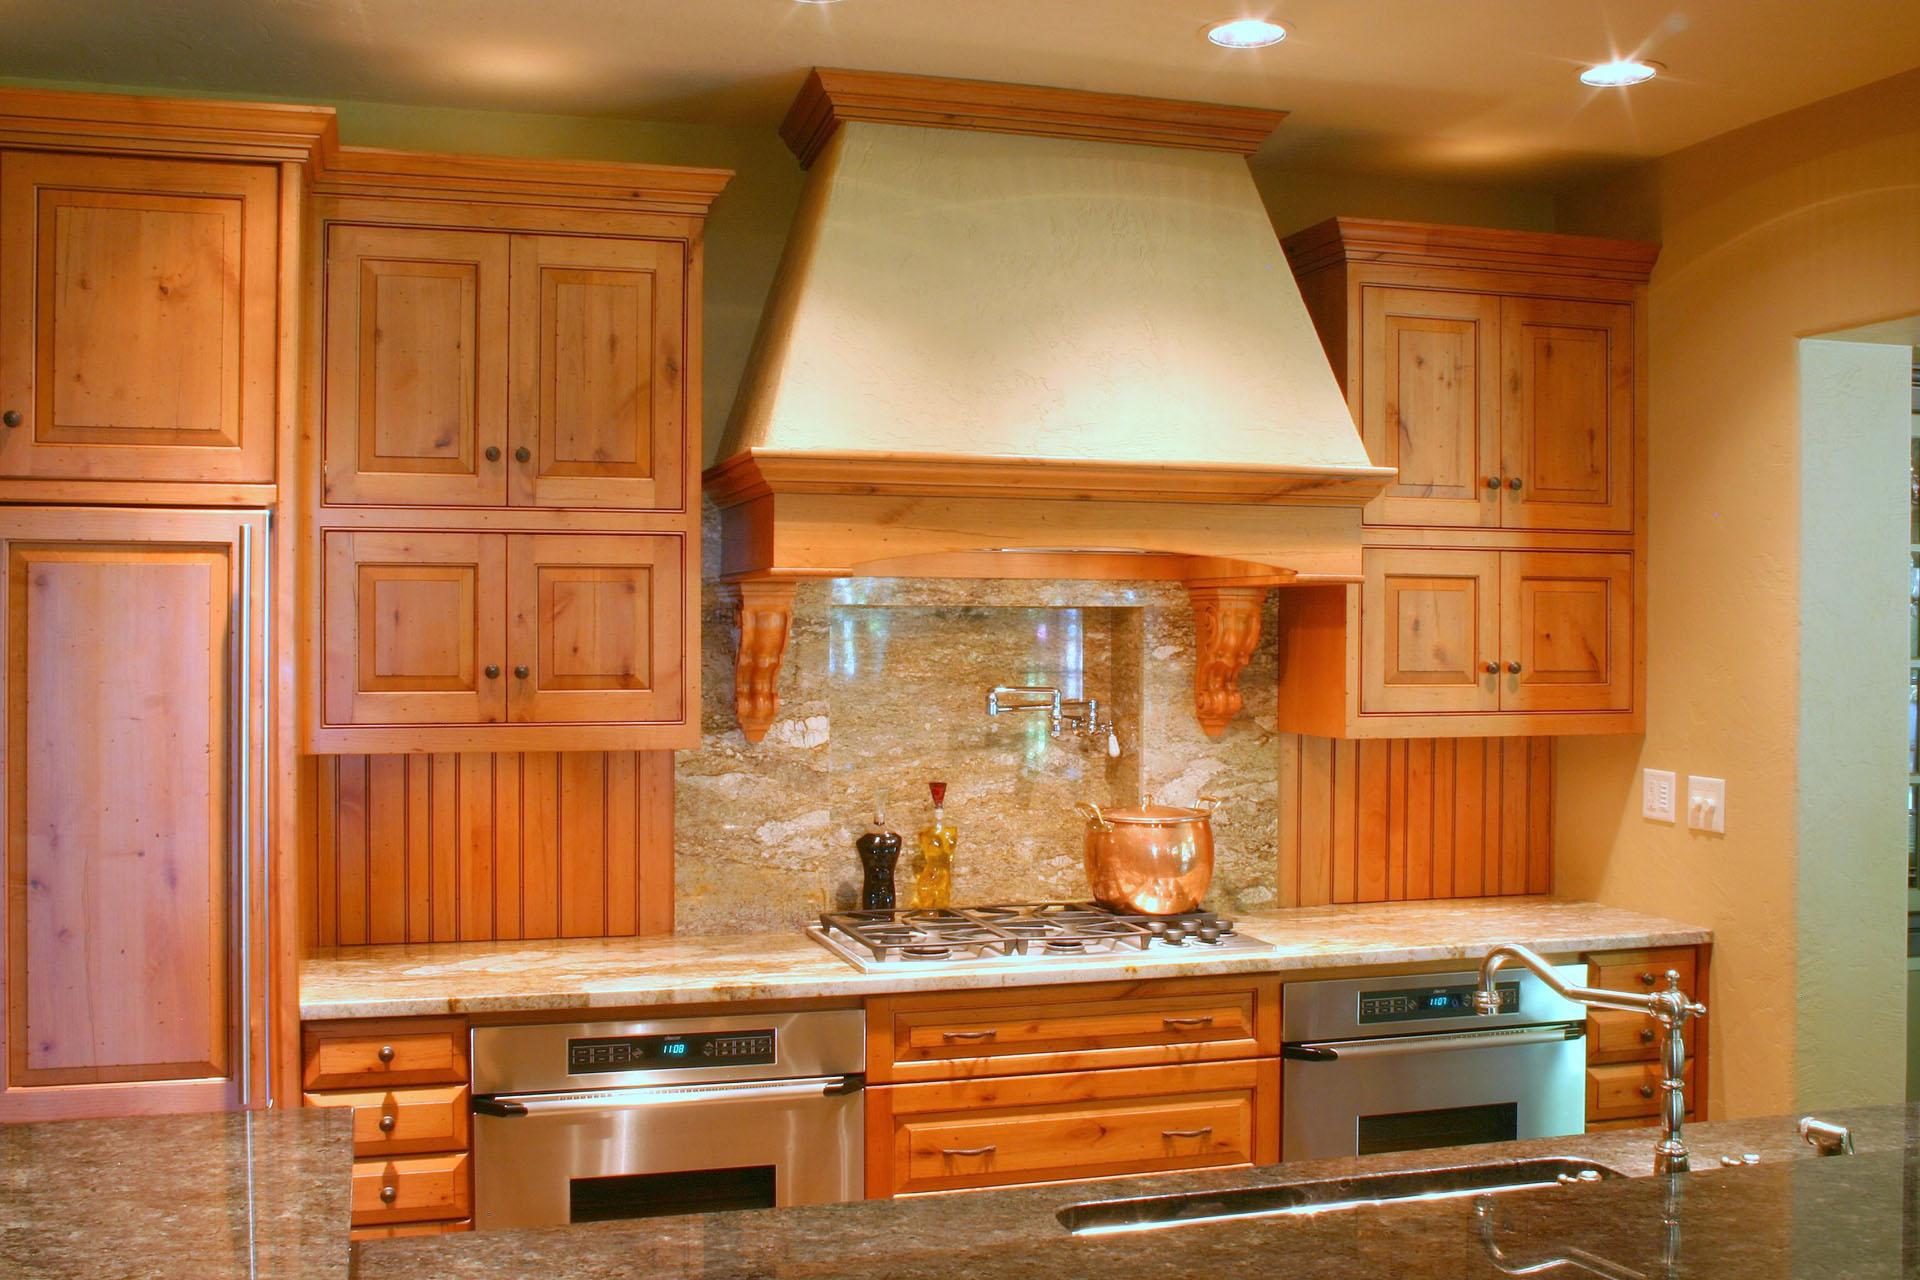 Limehouse Distressed Alder Kitchen with Appliance Garages